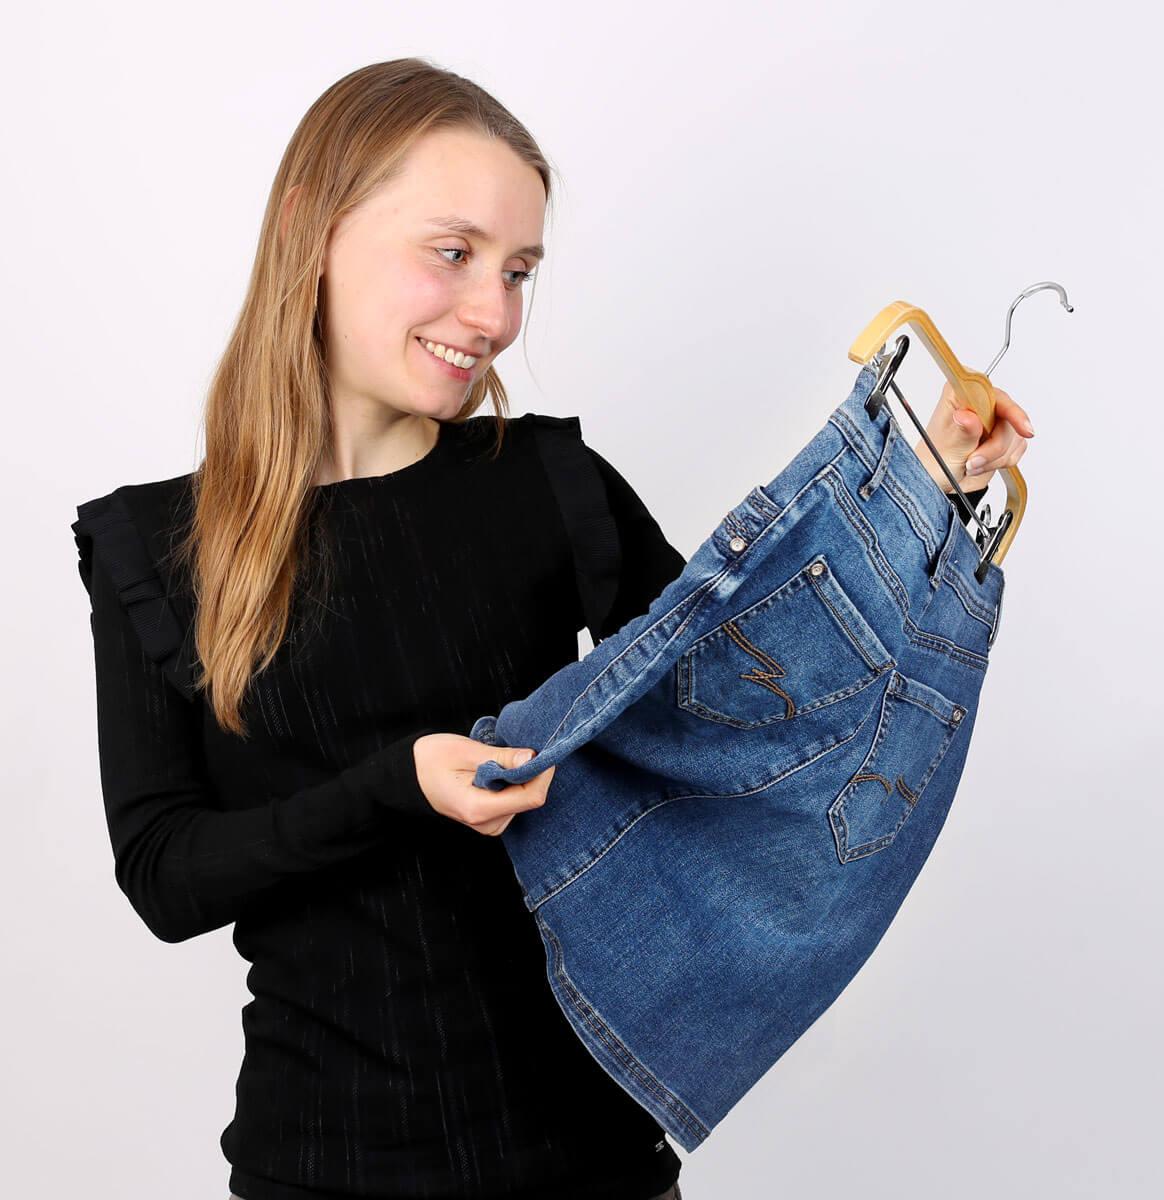 Röcke für jede Figur